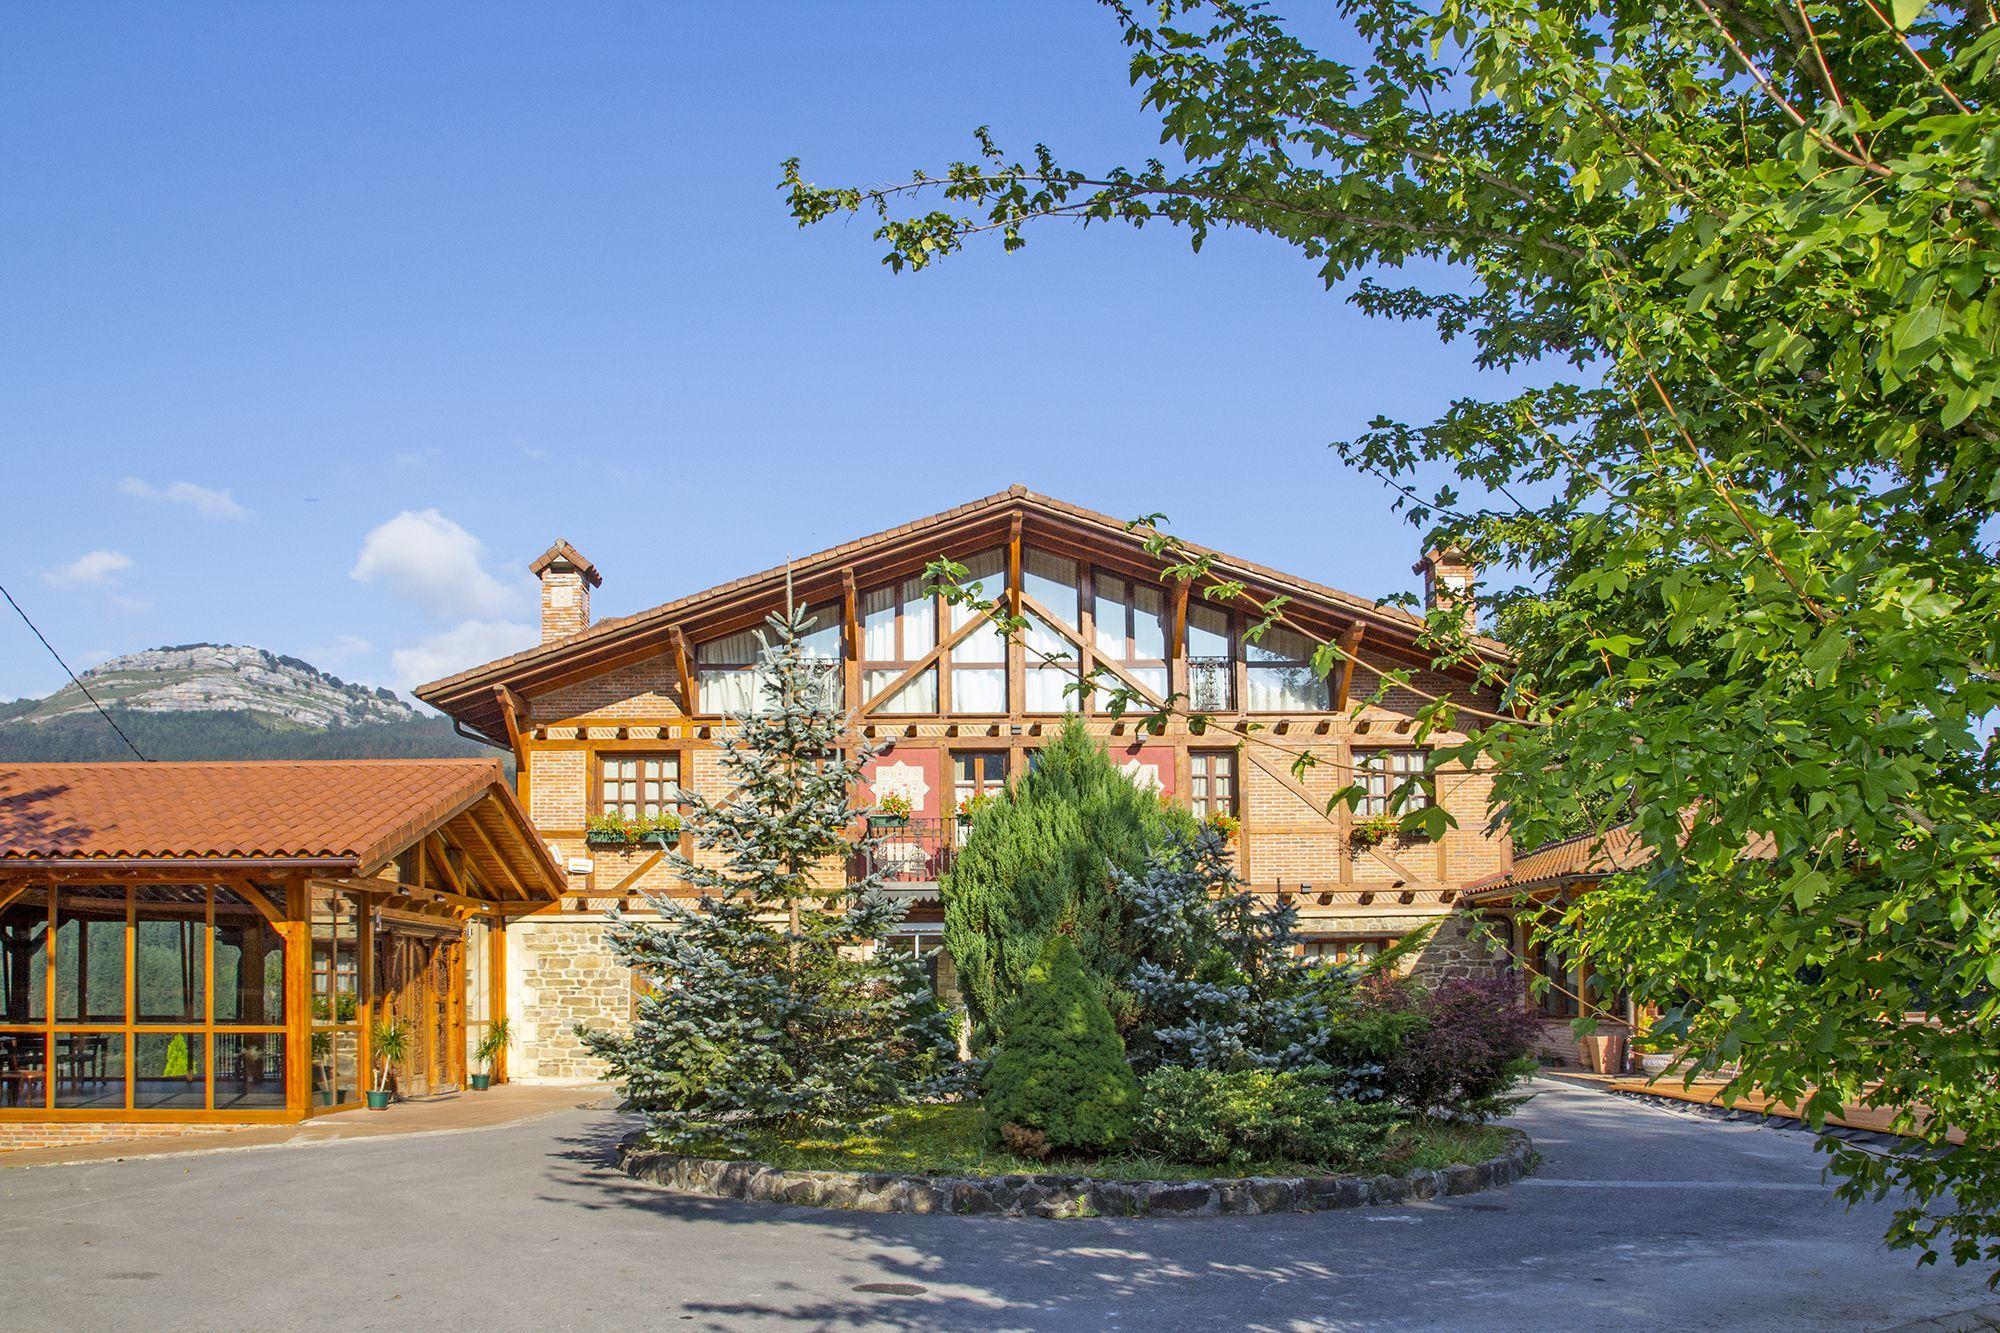 Hotel Spa Etxegana